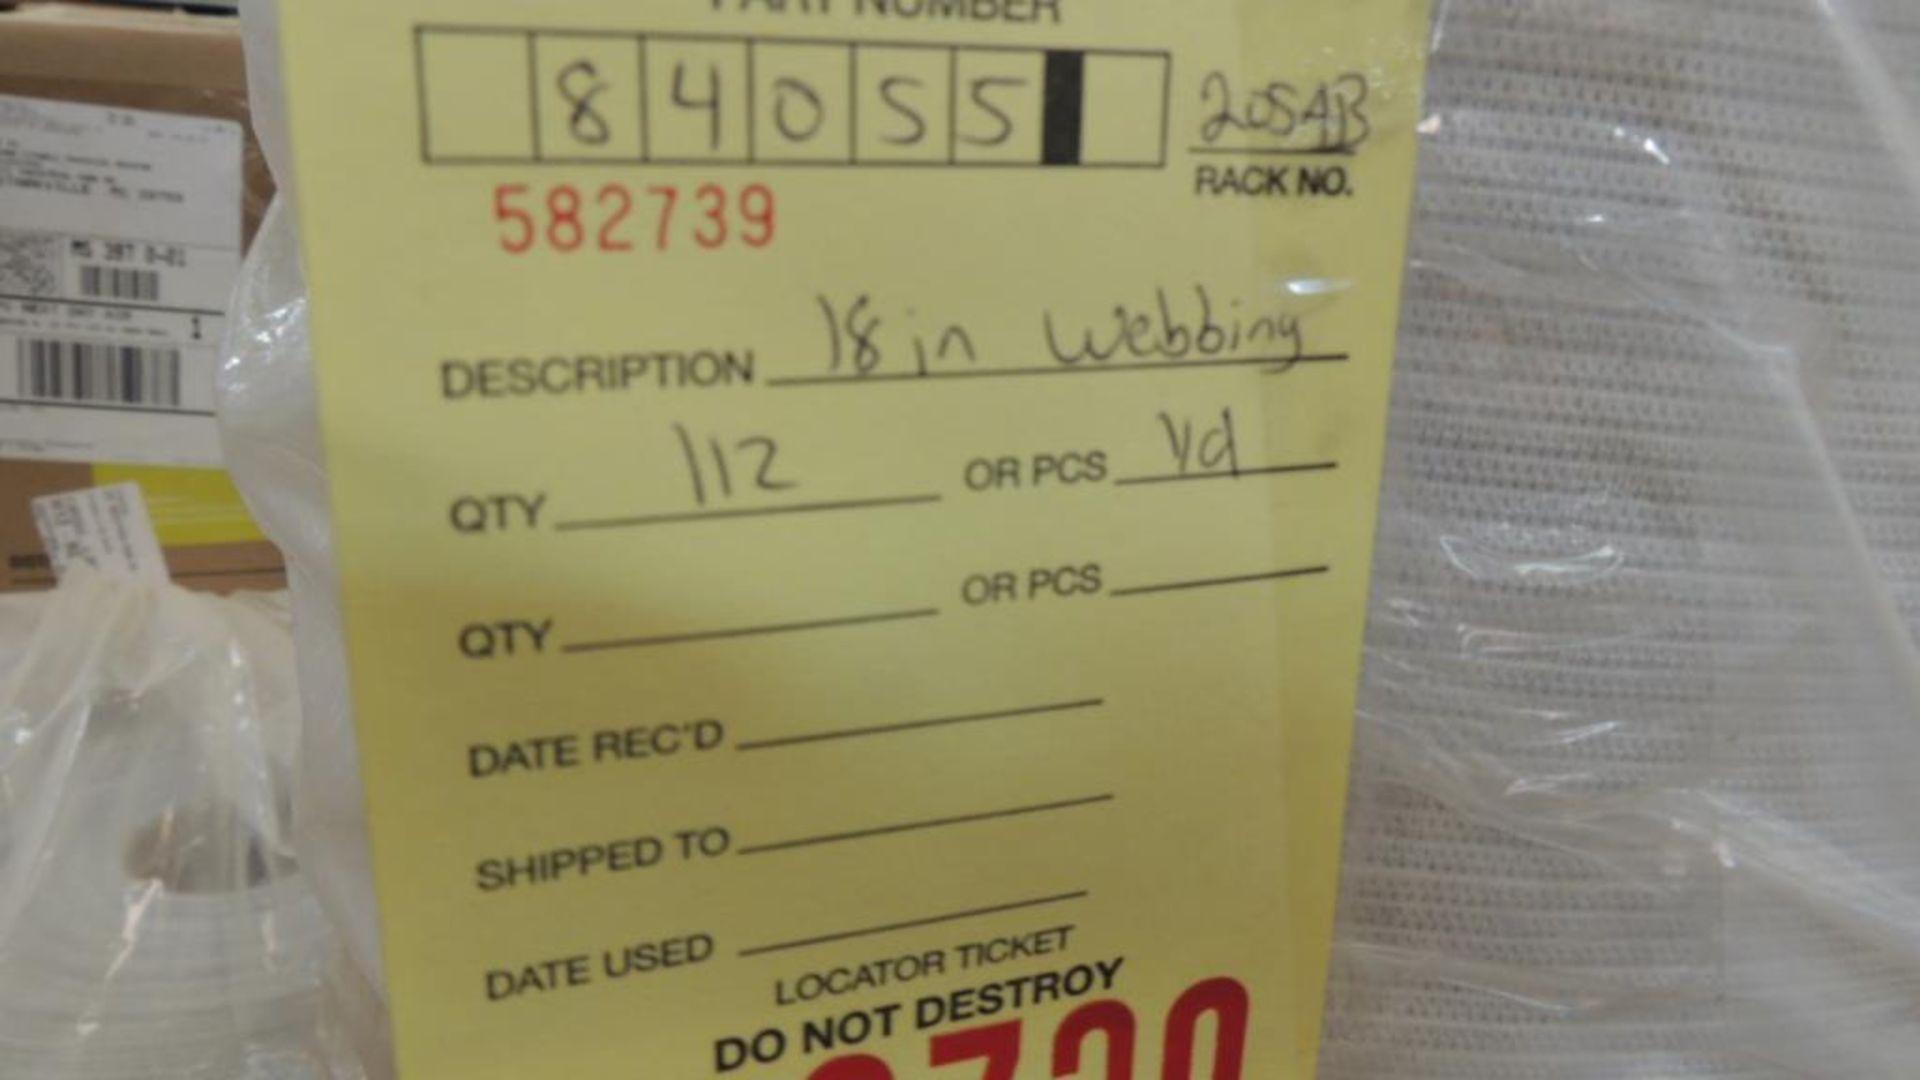 Lot 2291 - Webbing